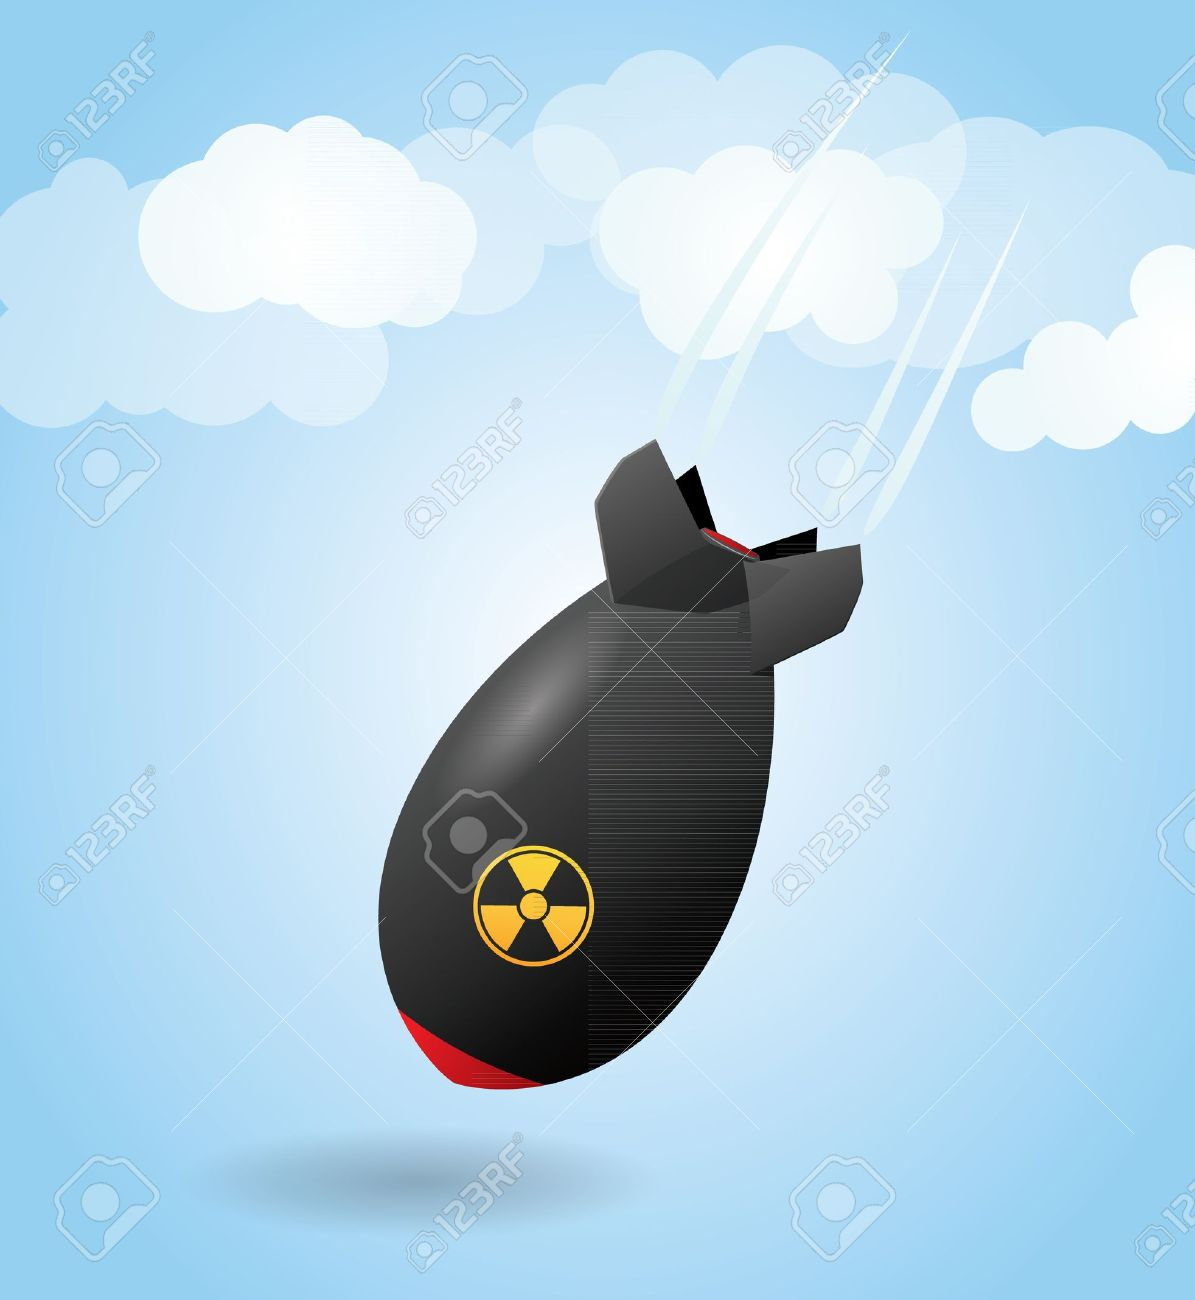 Cartoon rocket bomb Stock Vector - 12158097